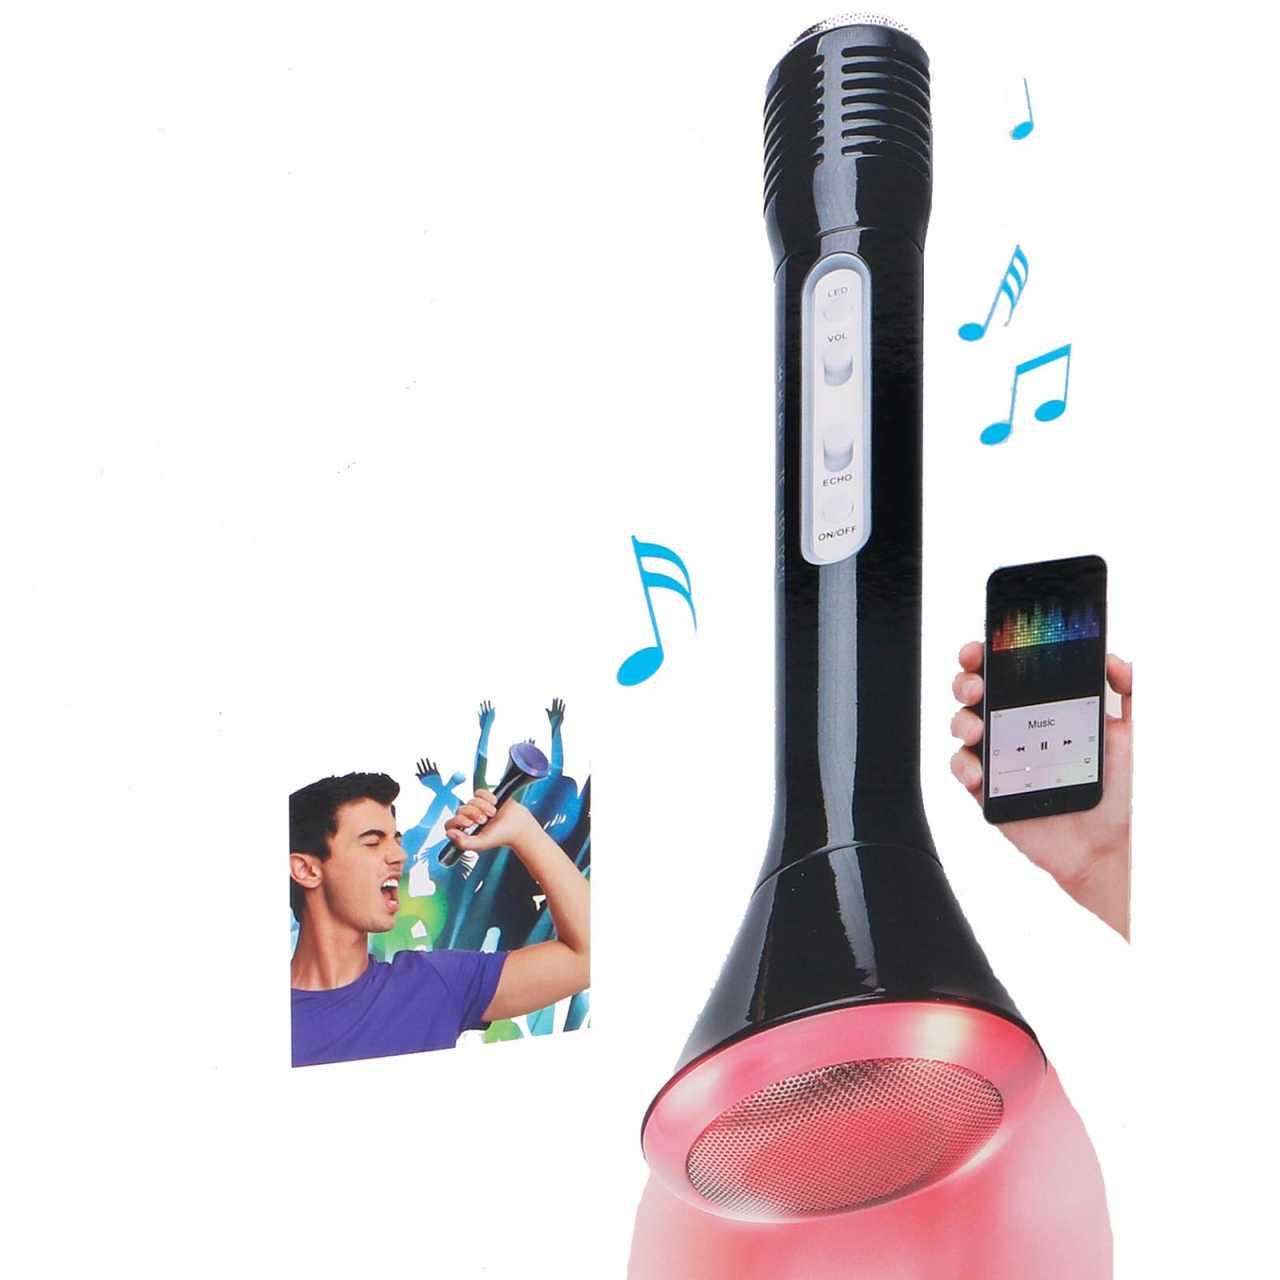 Soundlogic Light-Up 2in1 Karaoke-Mikrofon mit Lautsprecher